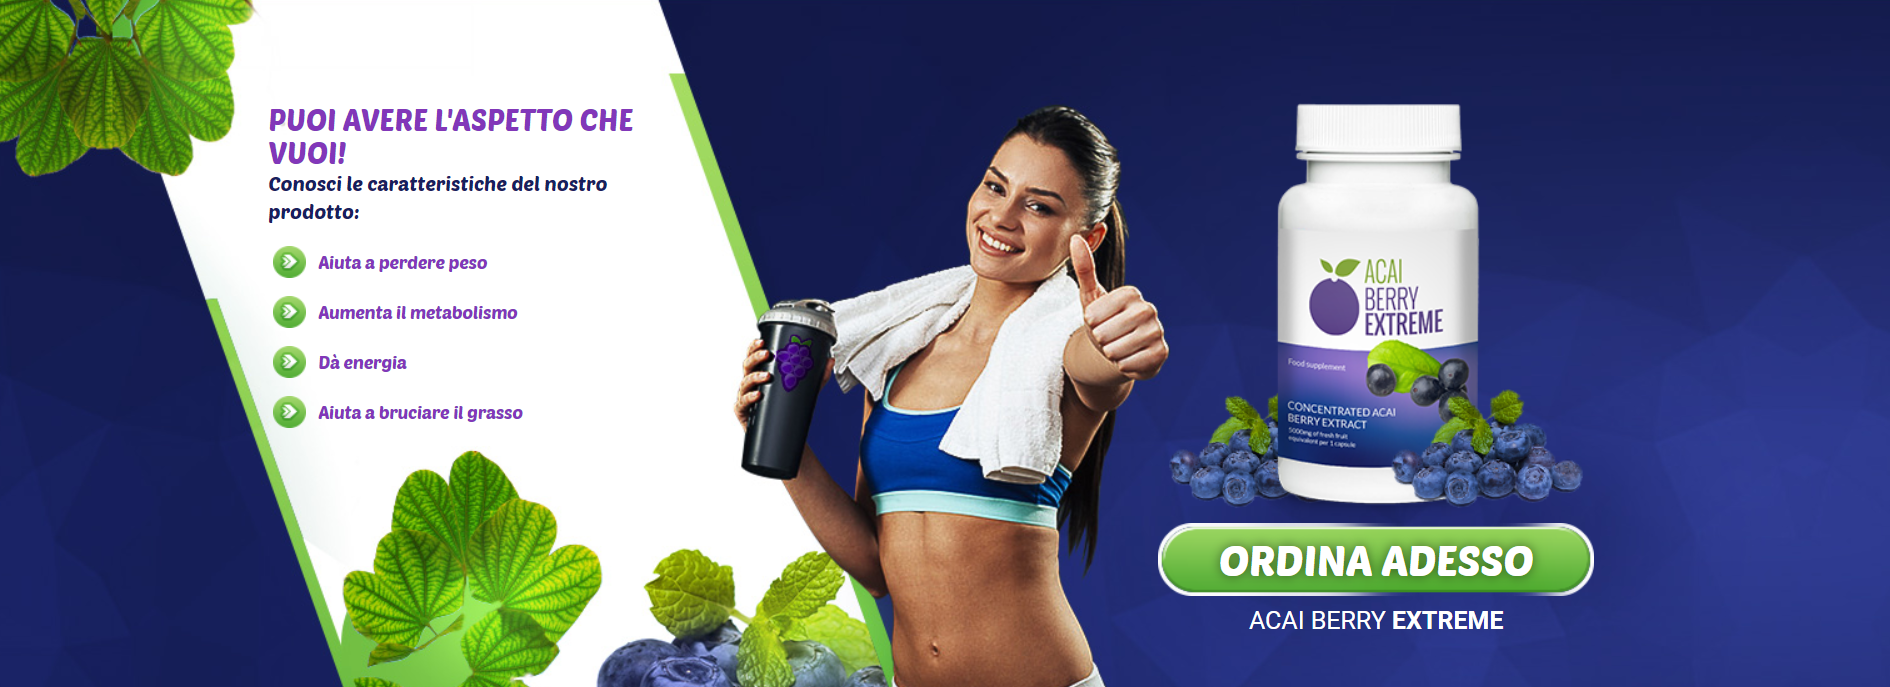 benefici di acai berry supplementi di perdita di peso